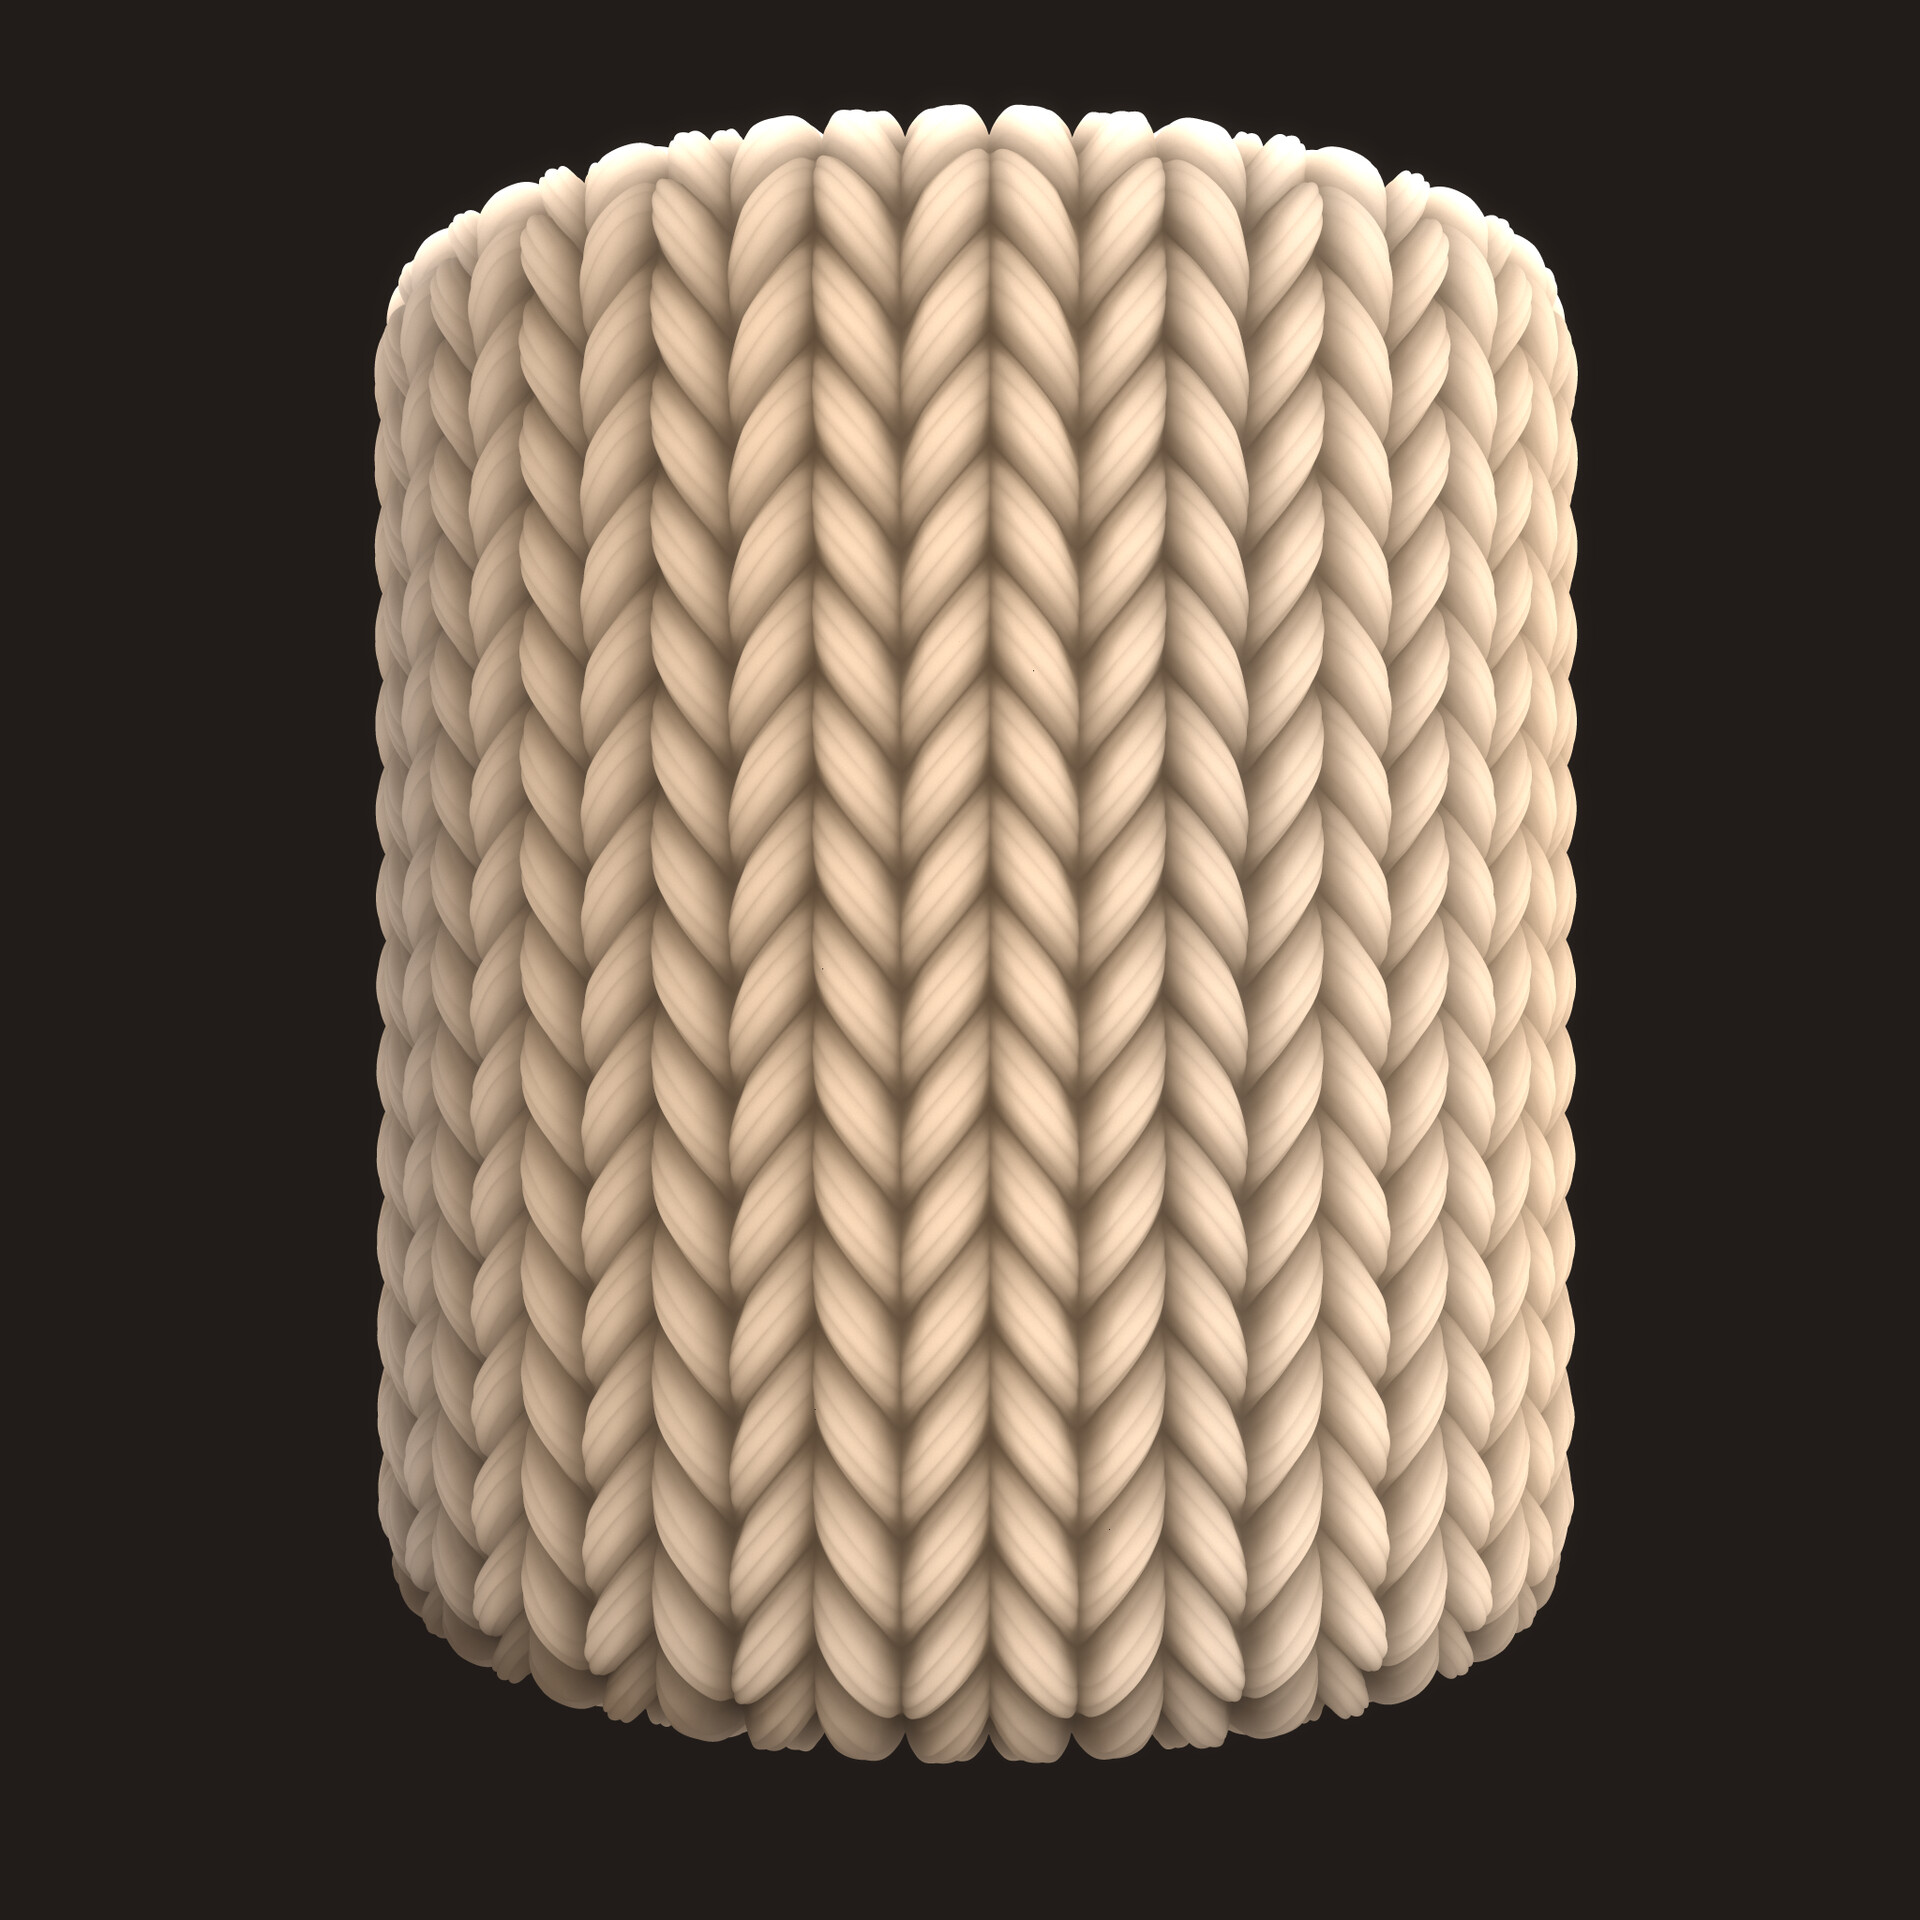 Weston mitchell knitted2